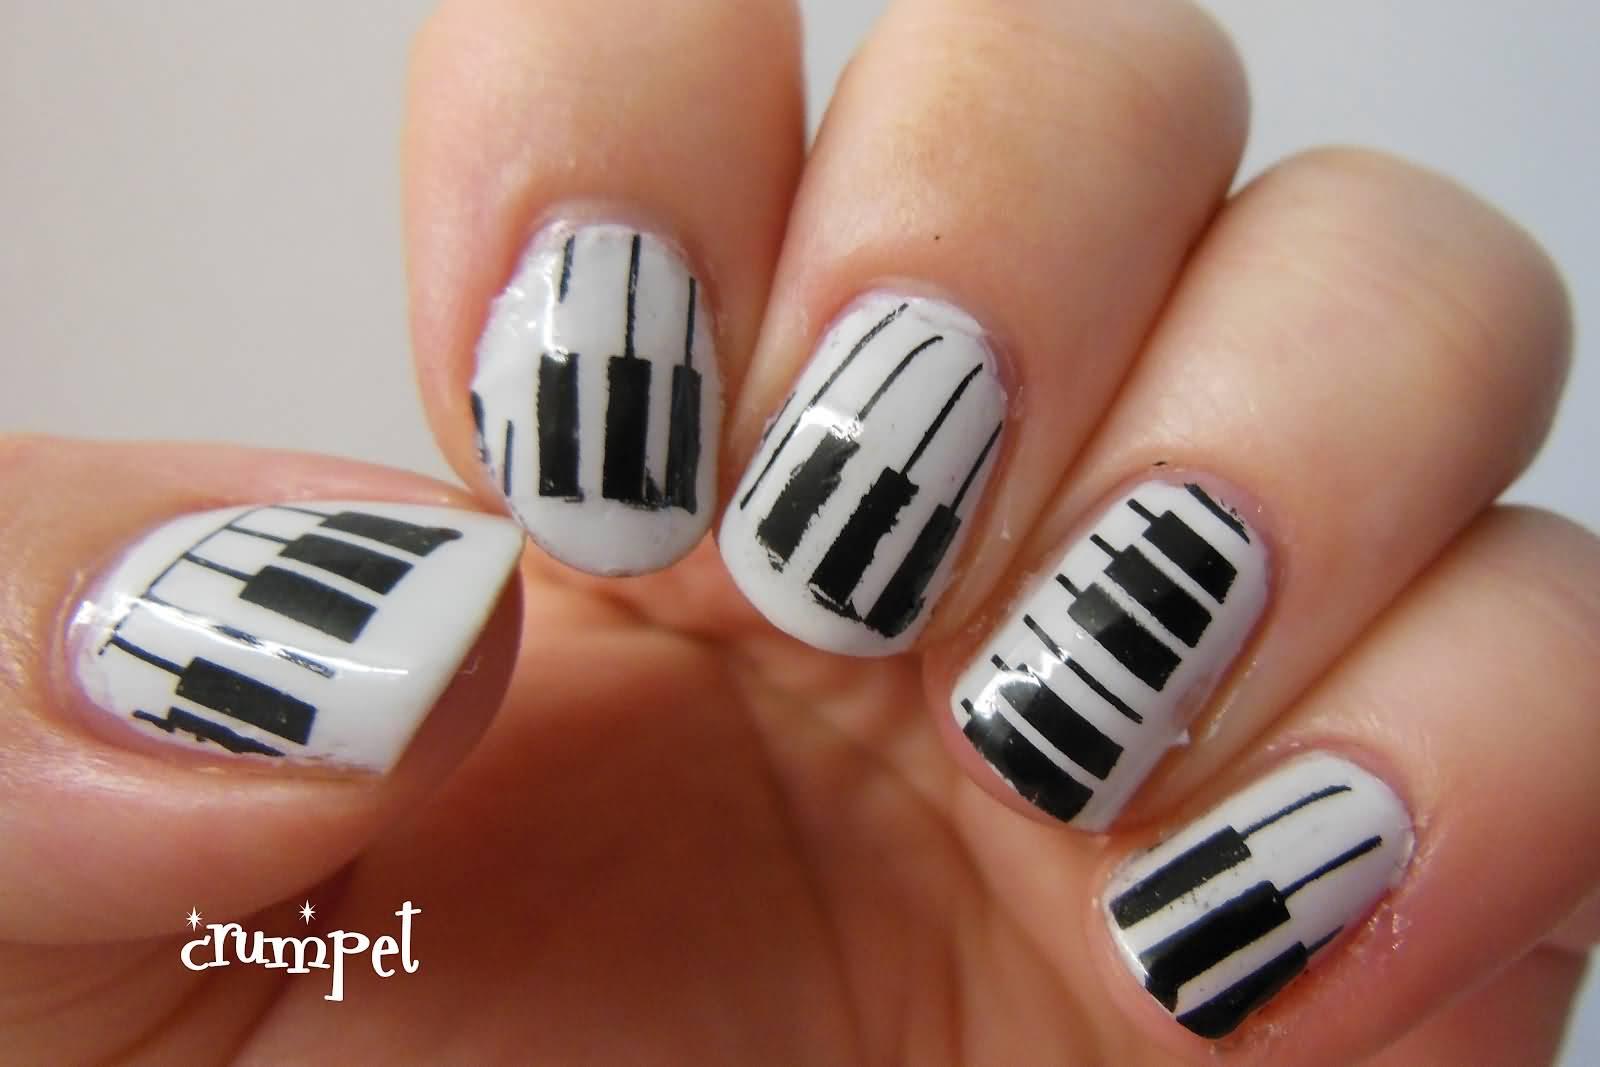 75 most stylish nail art pattern design ideas black and white piano pattern nail art design idea prinsesfo Images